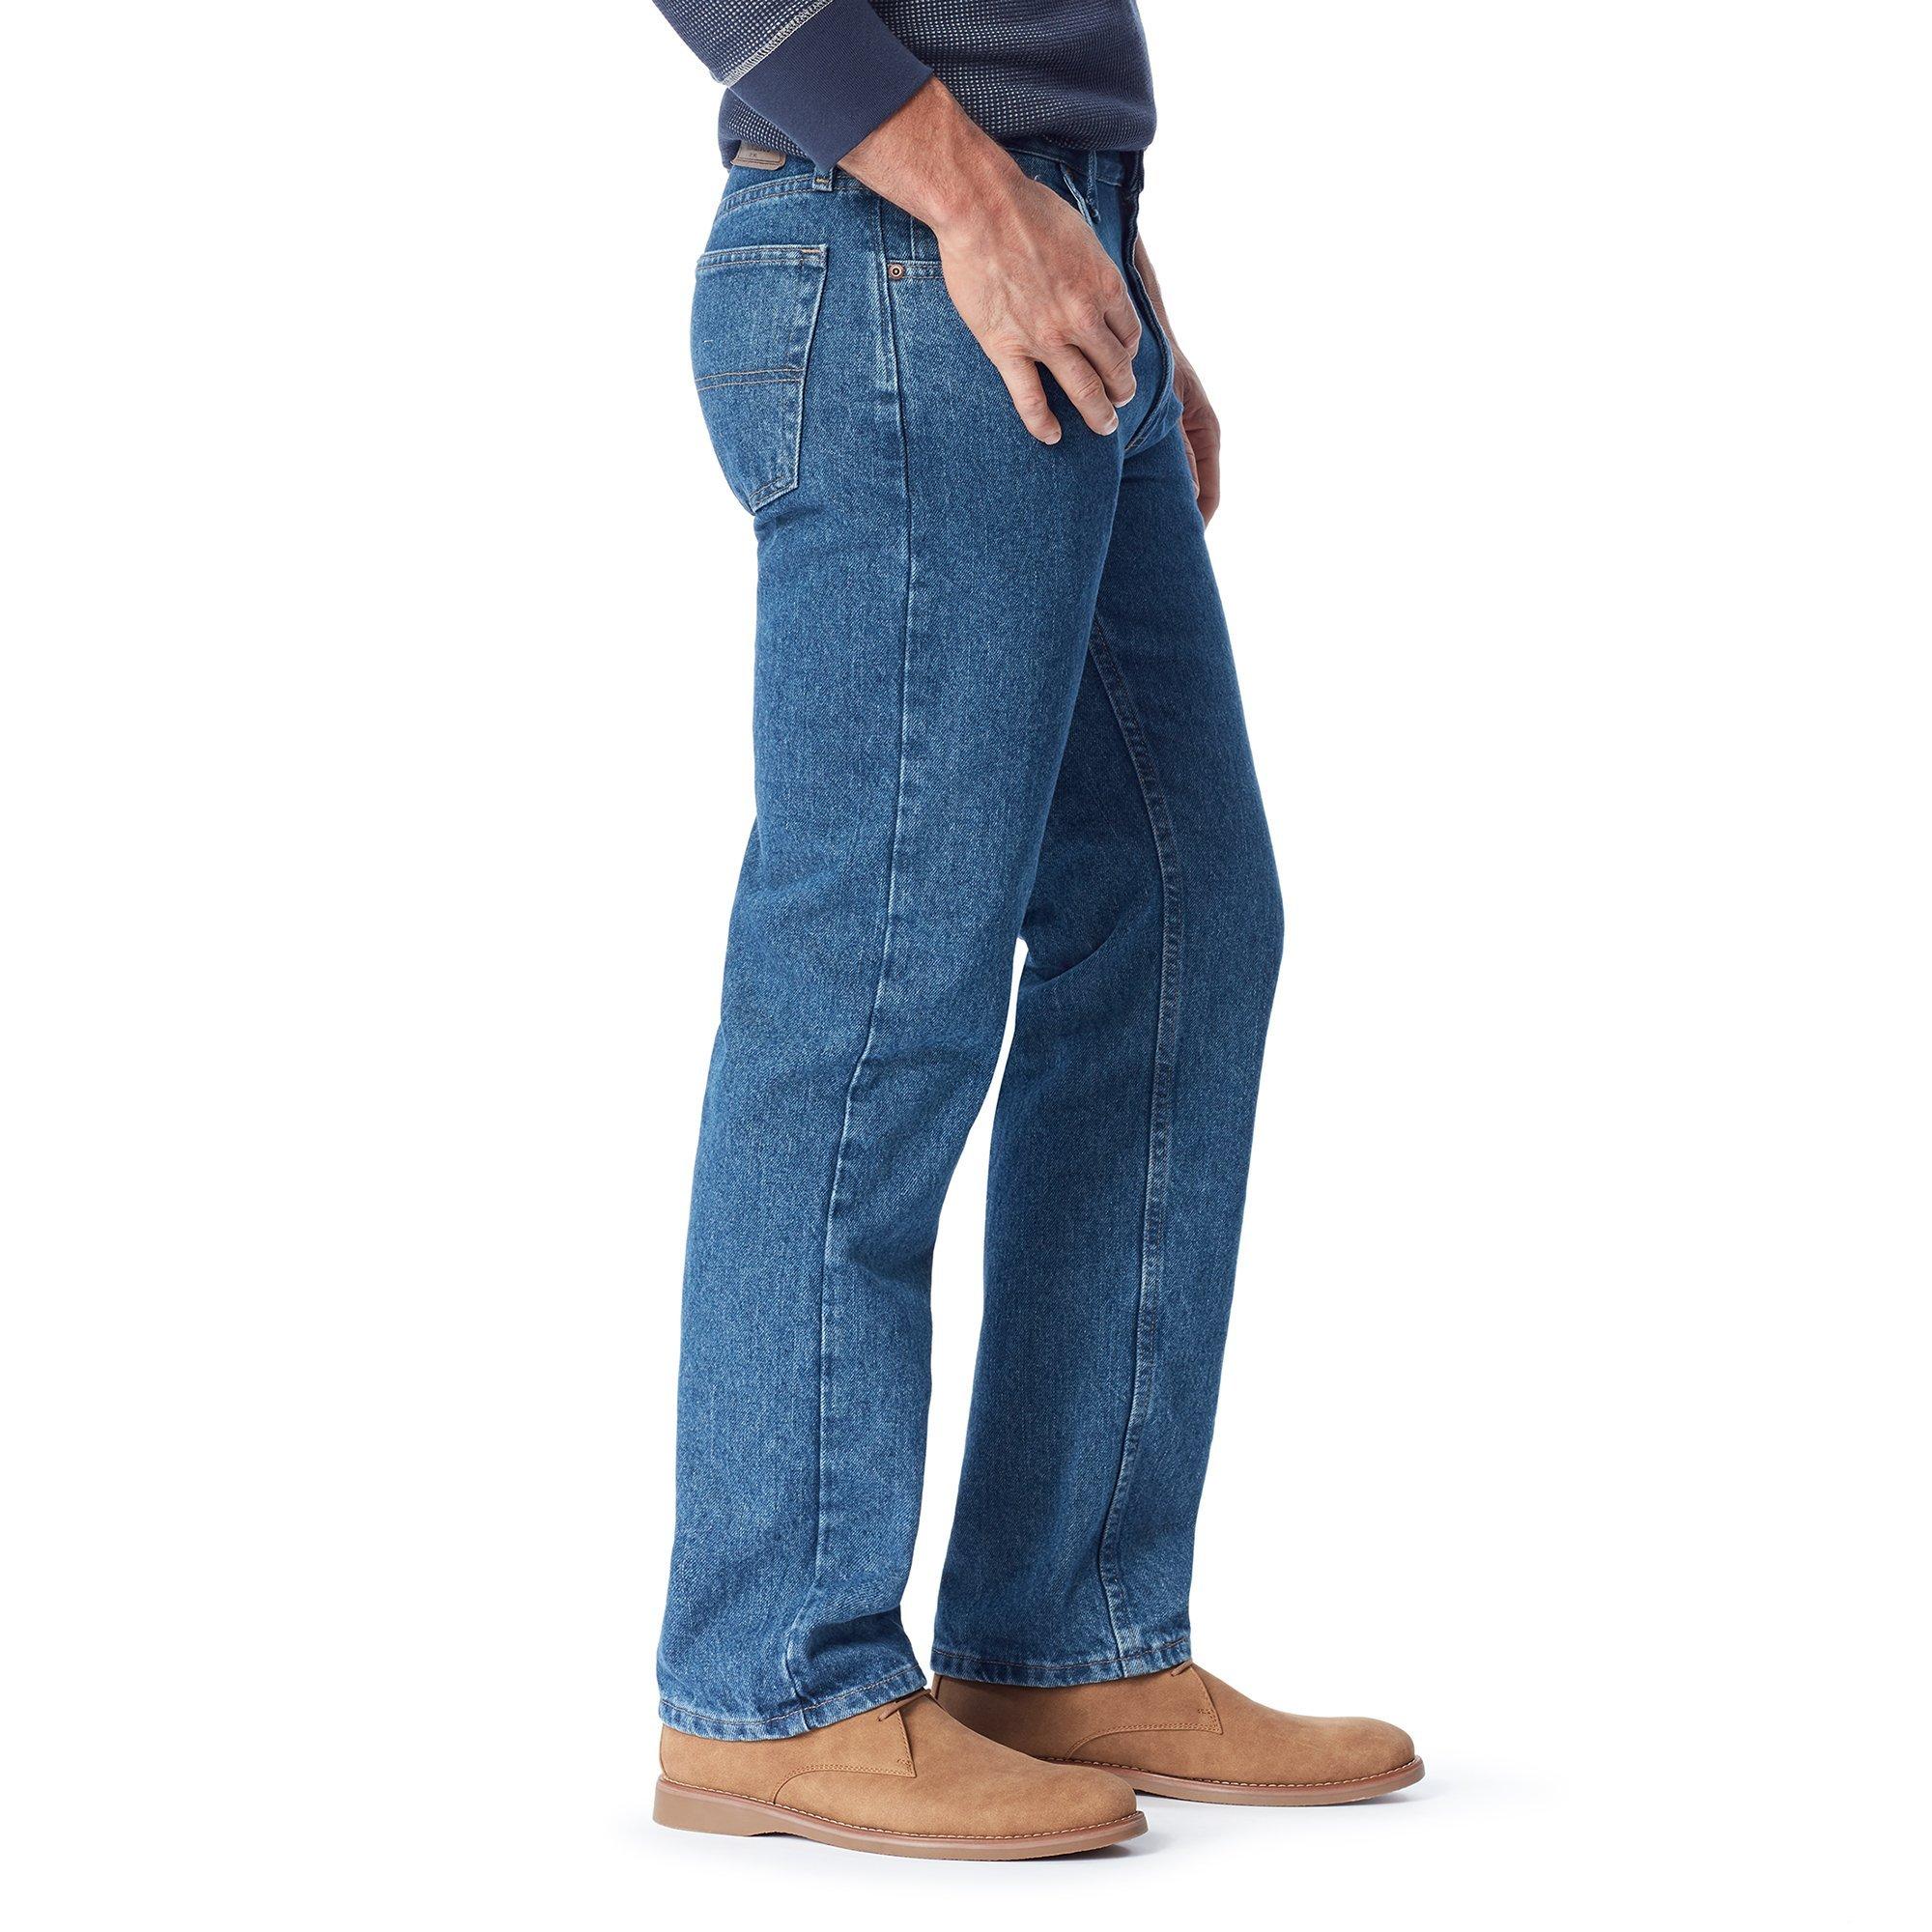 Wrangler Authentics Men's Classic 5-Pocket Regular Fit Jean,Stonewash Mid,34x28 by Wrangler (Image #6)